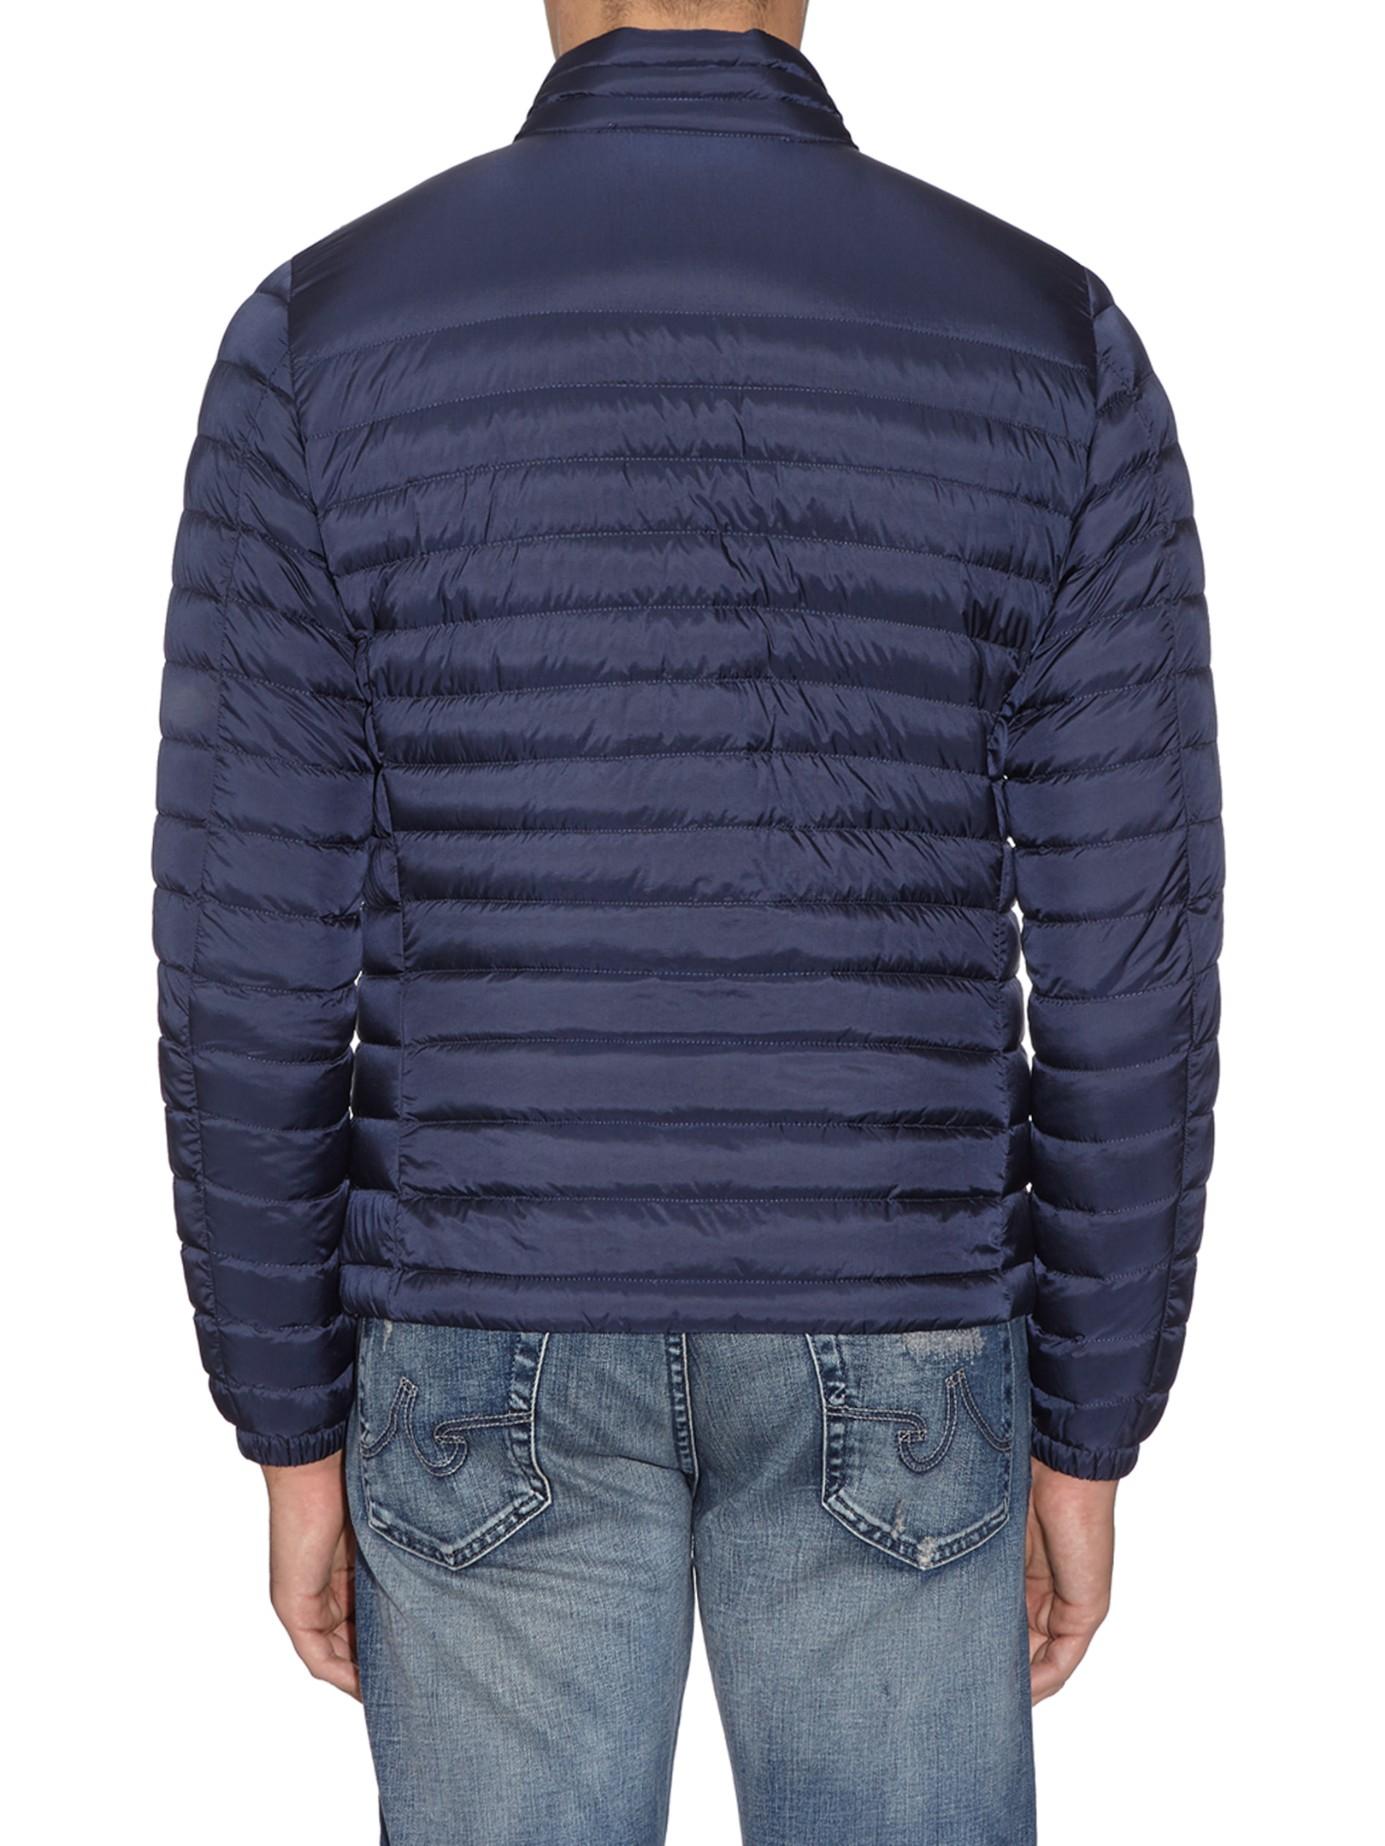 Woolrich Sundance Jacket Camo